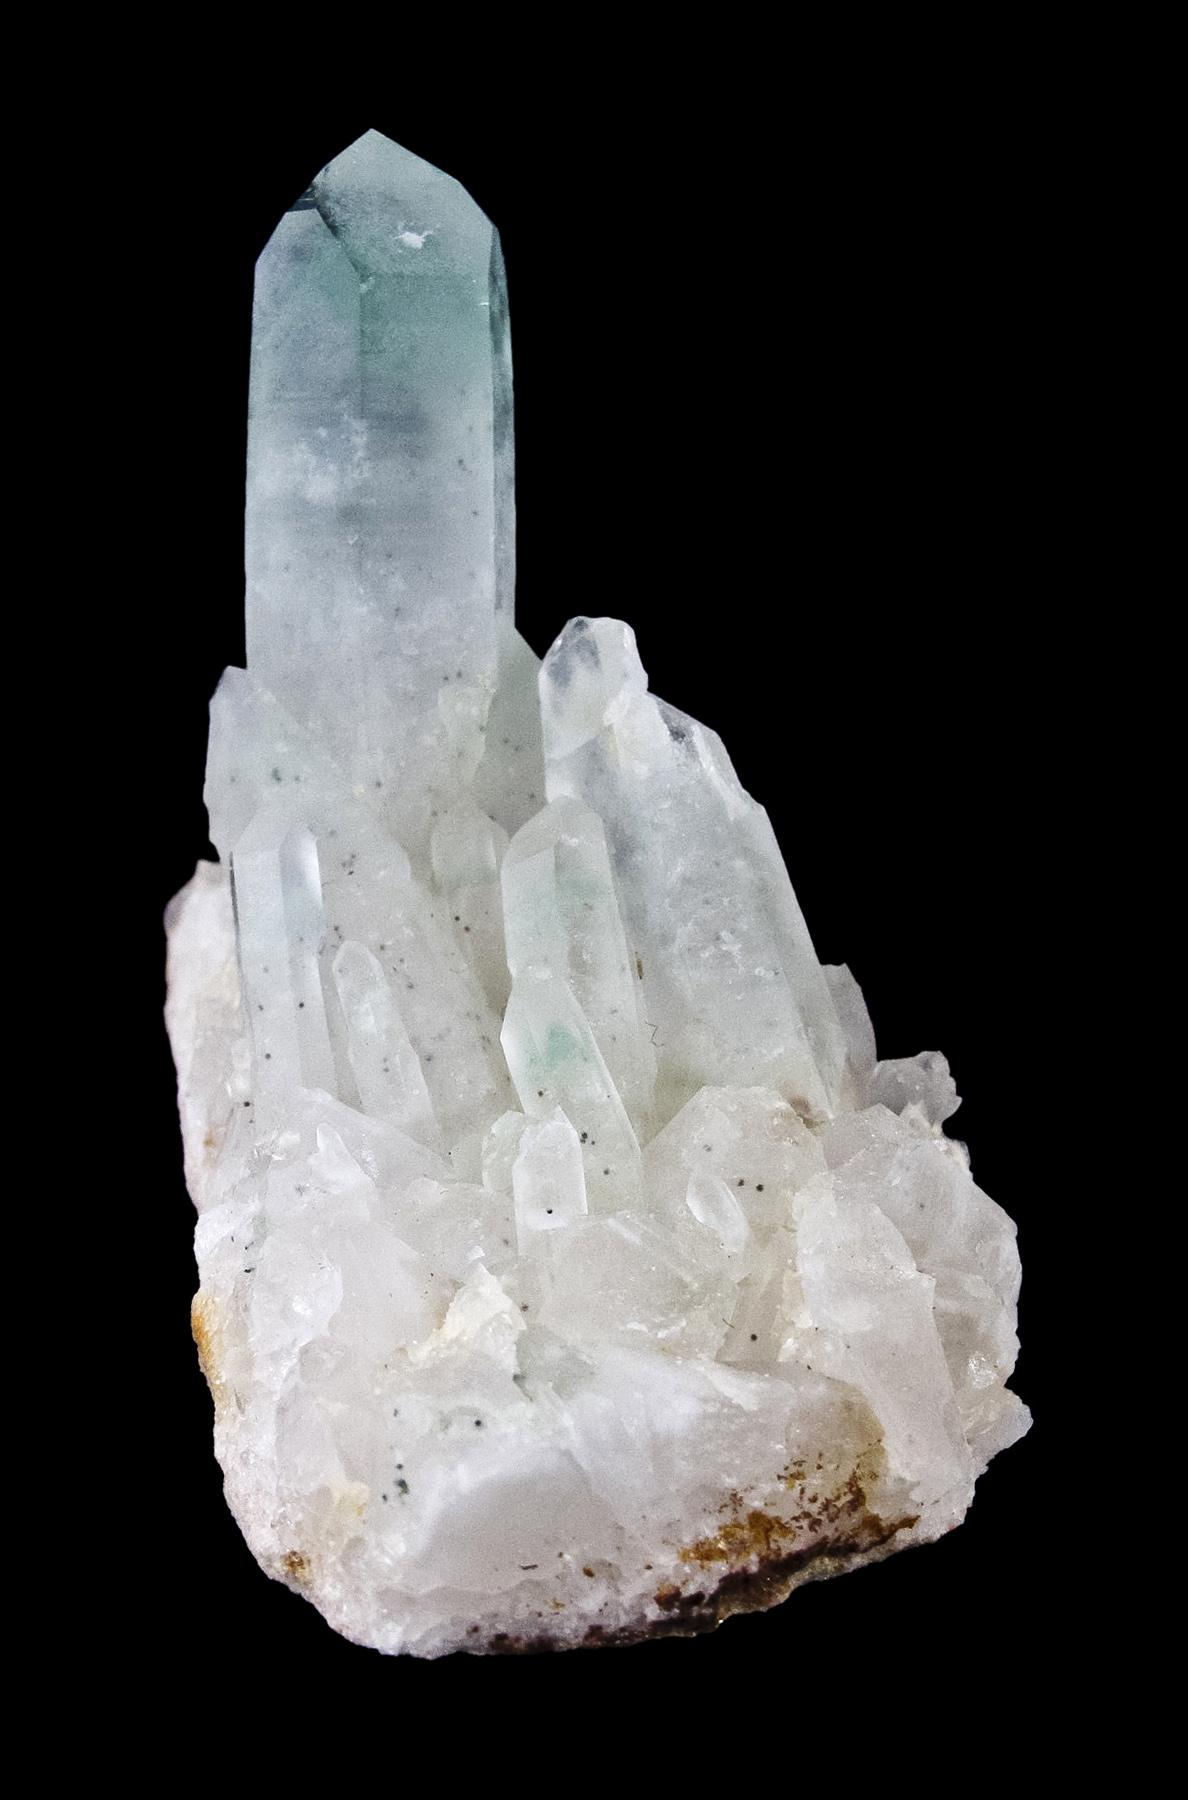 Perched vertically matrix milky quartz lesser crystals lustrous